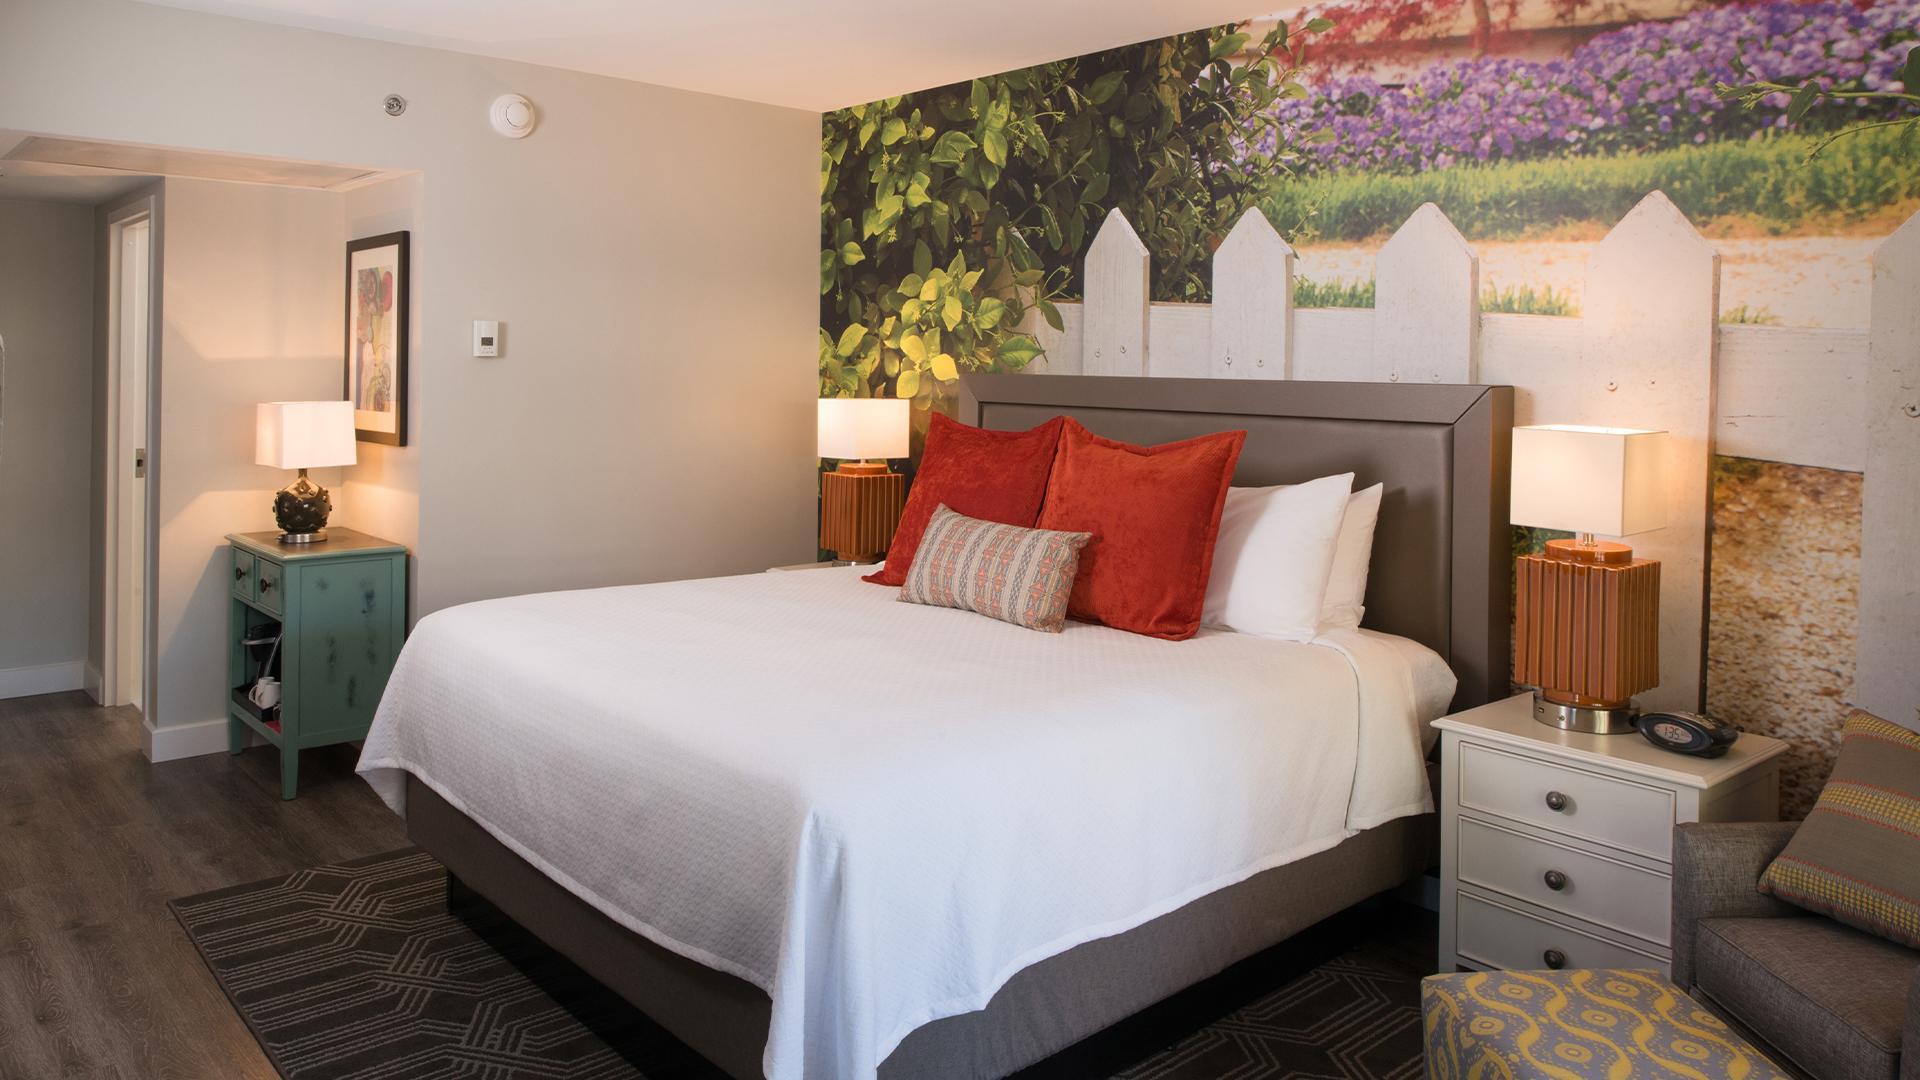 King Executive image 1 at Hotel Indigo Atlanta – Vinings by Cobb County, Georgia, United States